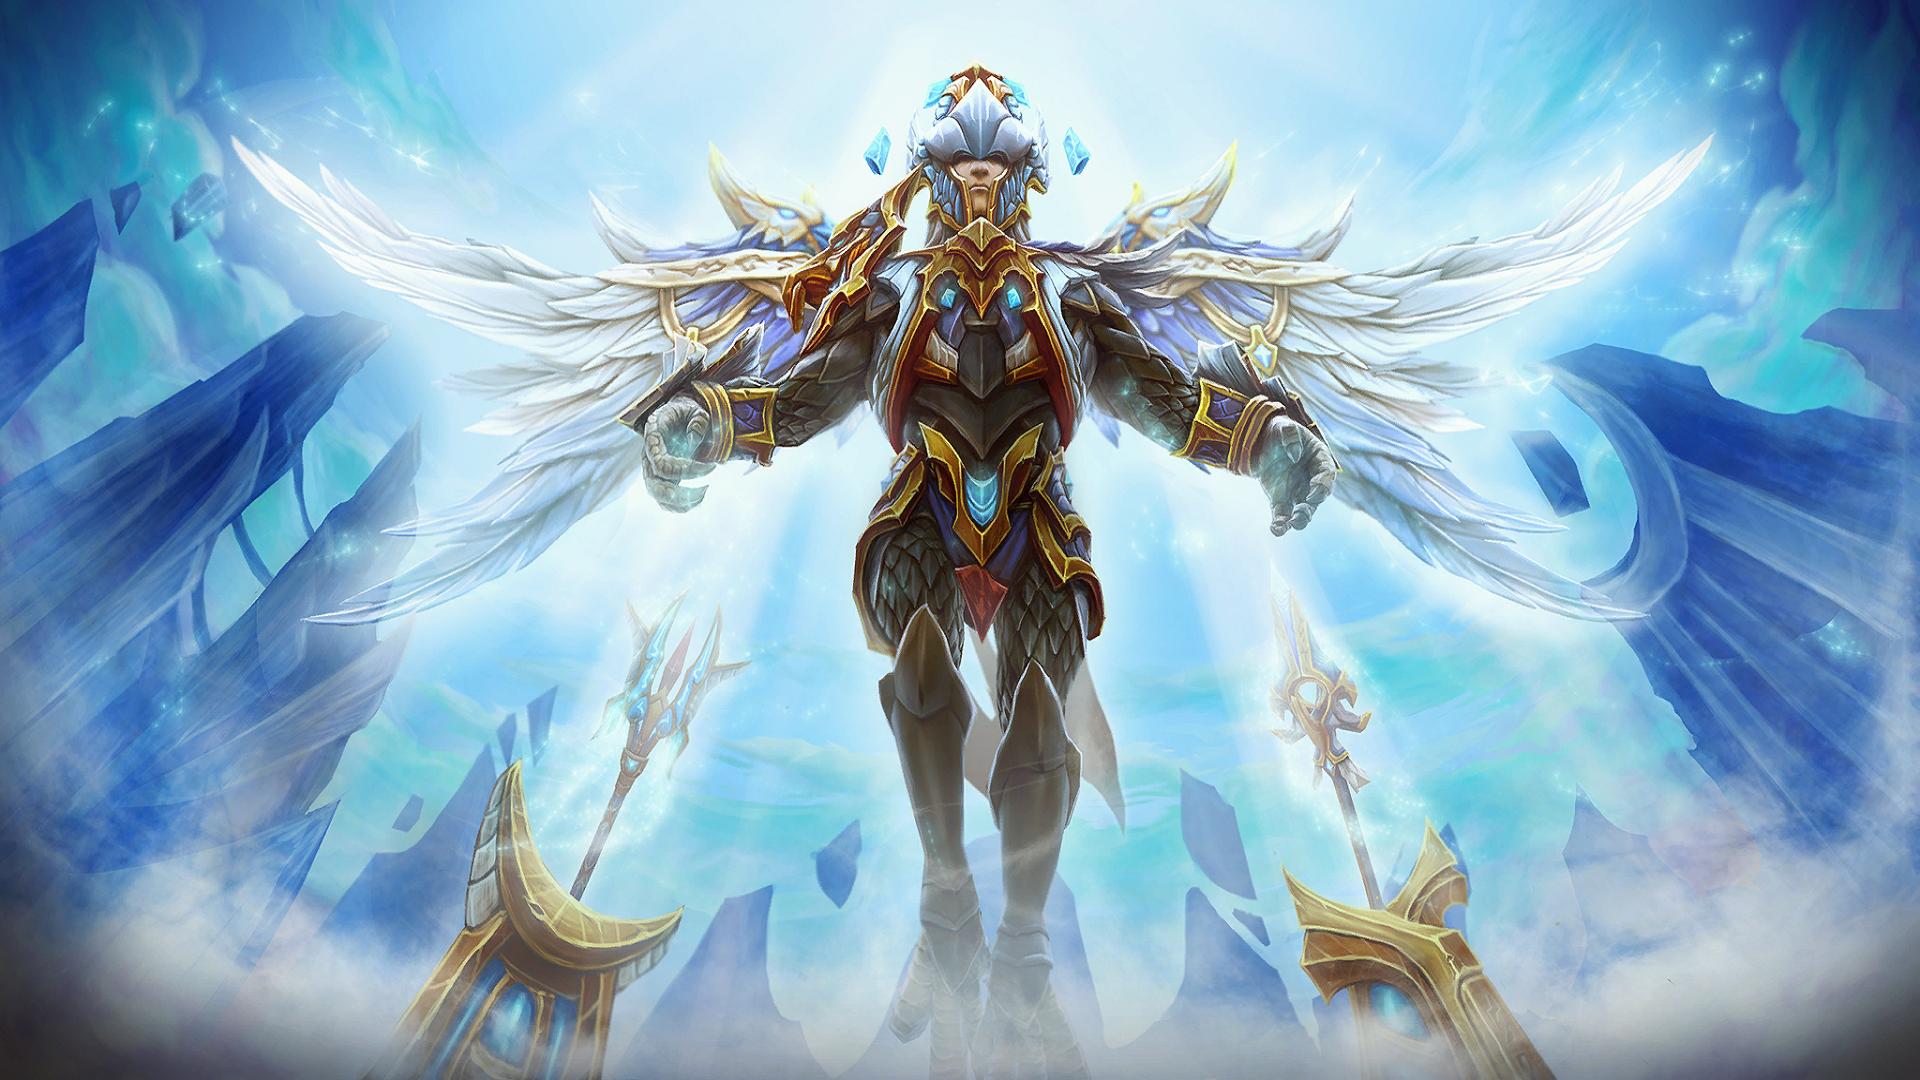 Illustration Video Games Fantasy Art Anime Angel Armor Hero Dota 2 Valve Mythology Corporation